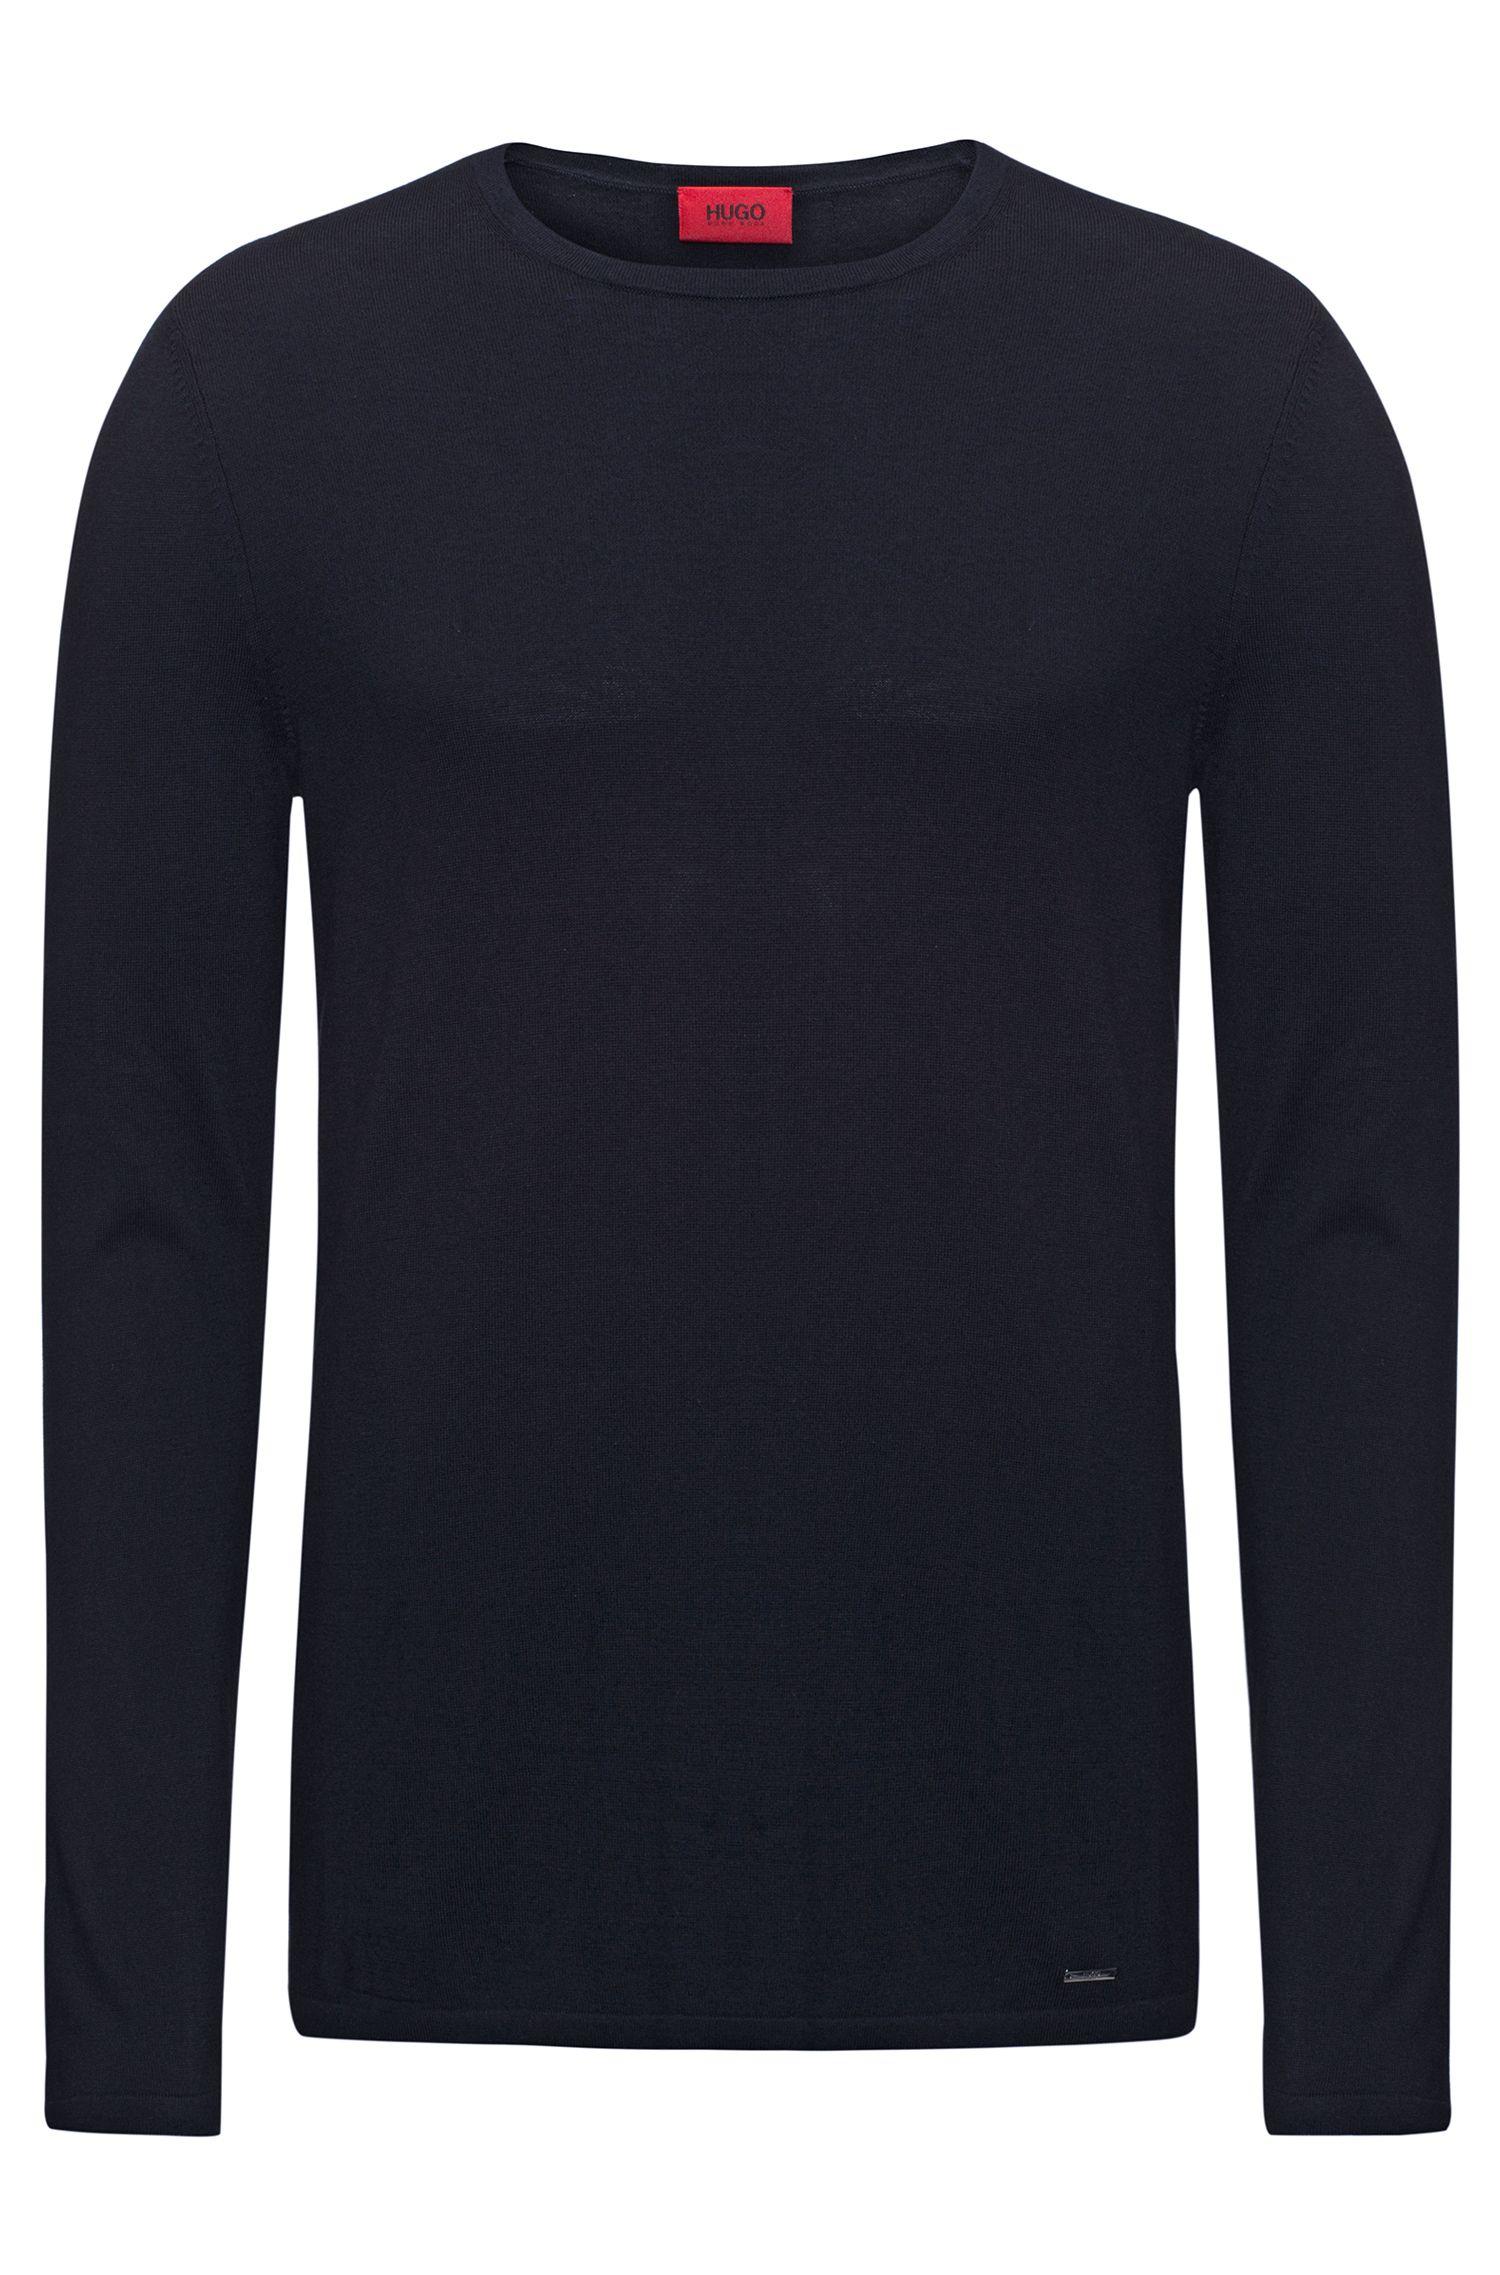 Cotton Blend Sweater   San Bastio